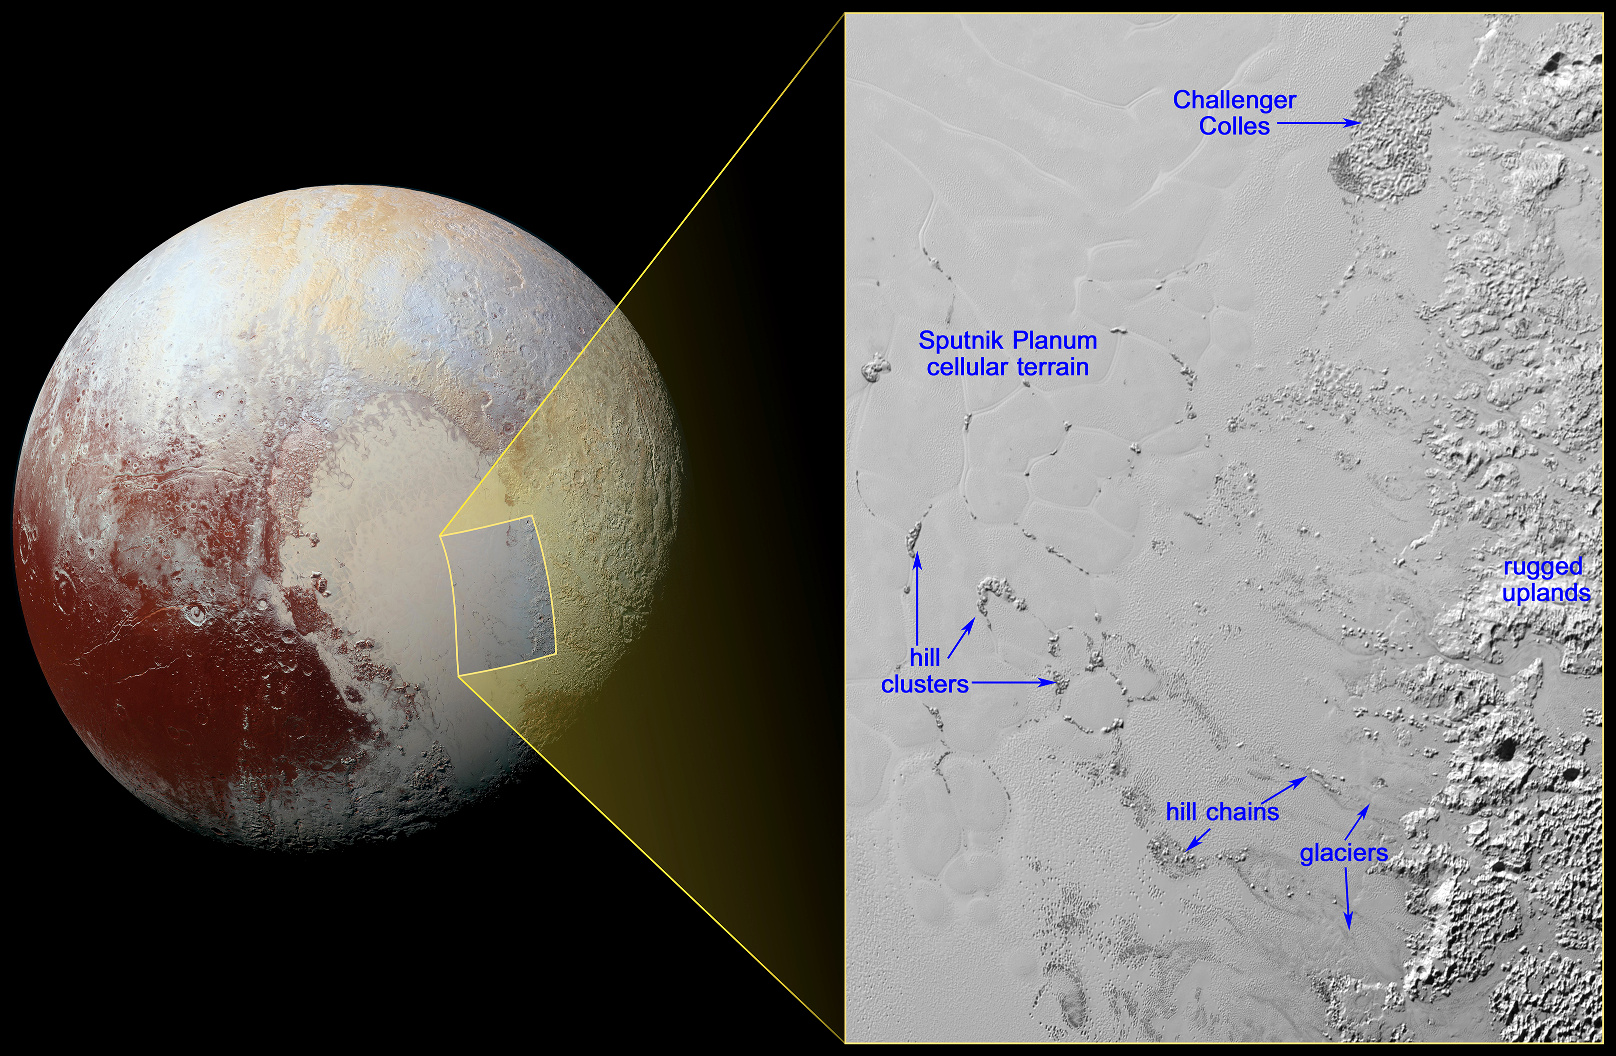 Image credits: NASA/JHUAPL/SwRI.